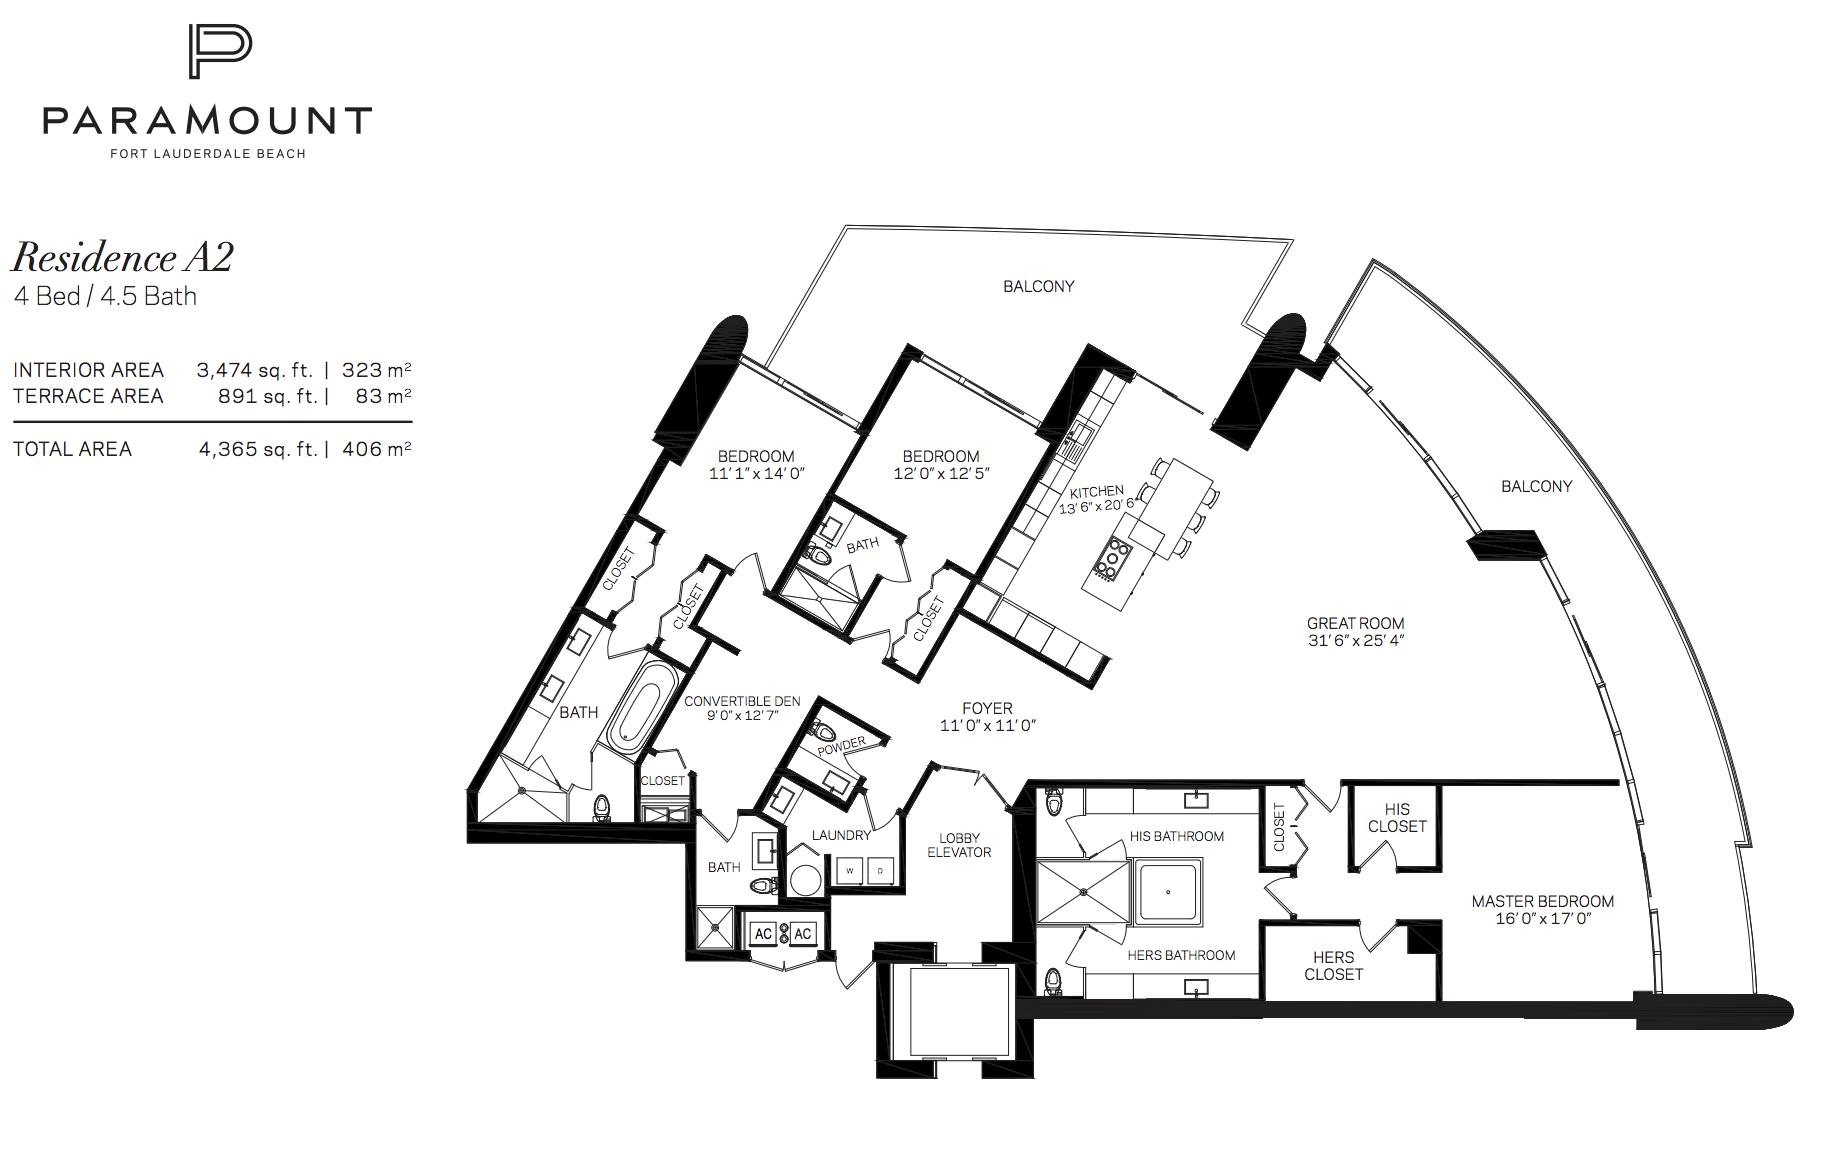 Paramount Residences Fort lauderdale Unit A2   4 Beds - 4.5Baths